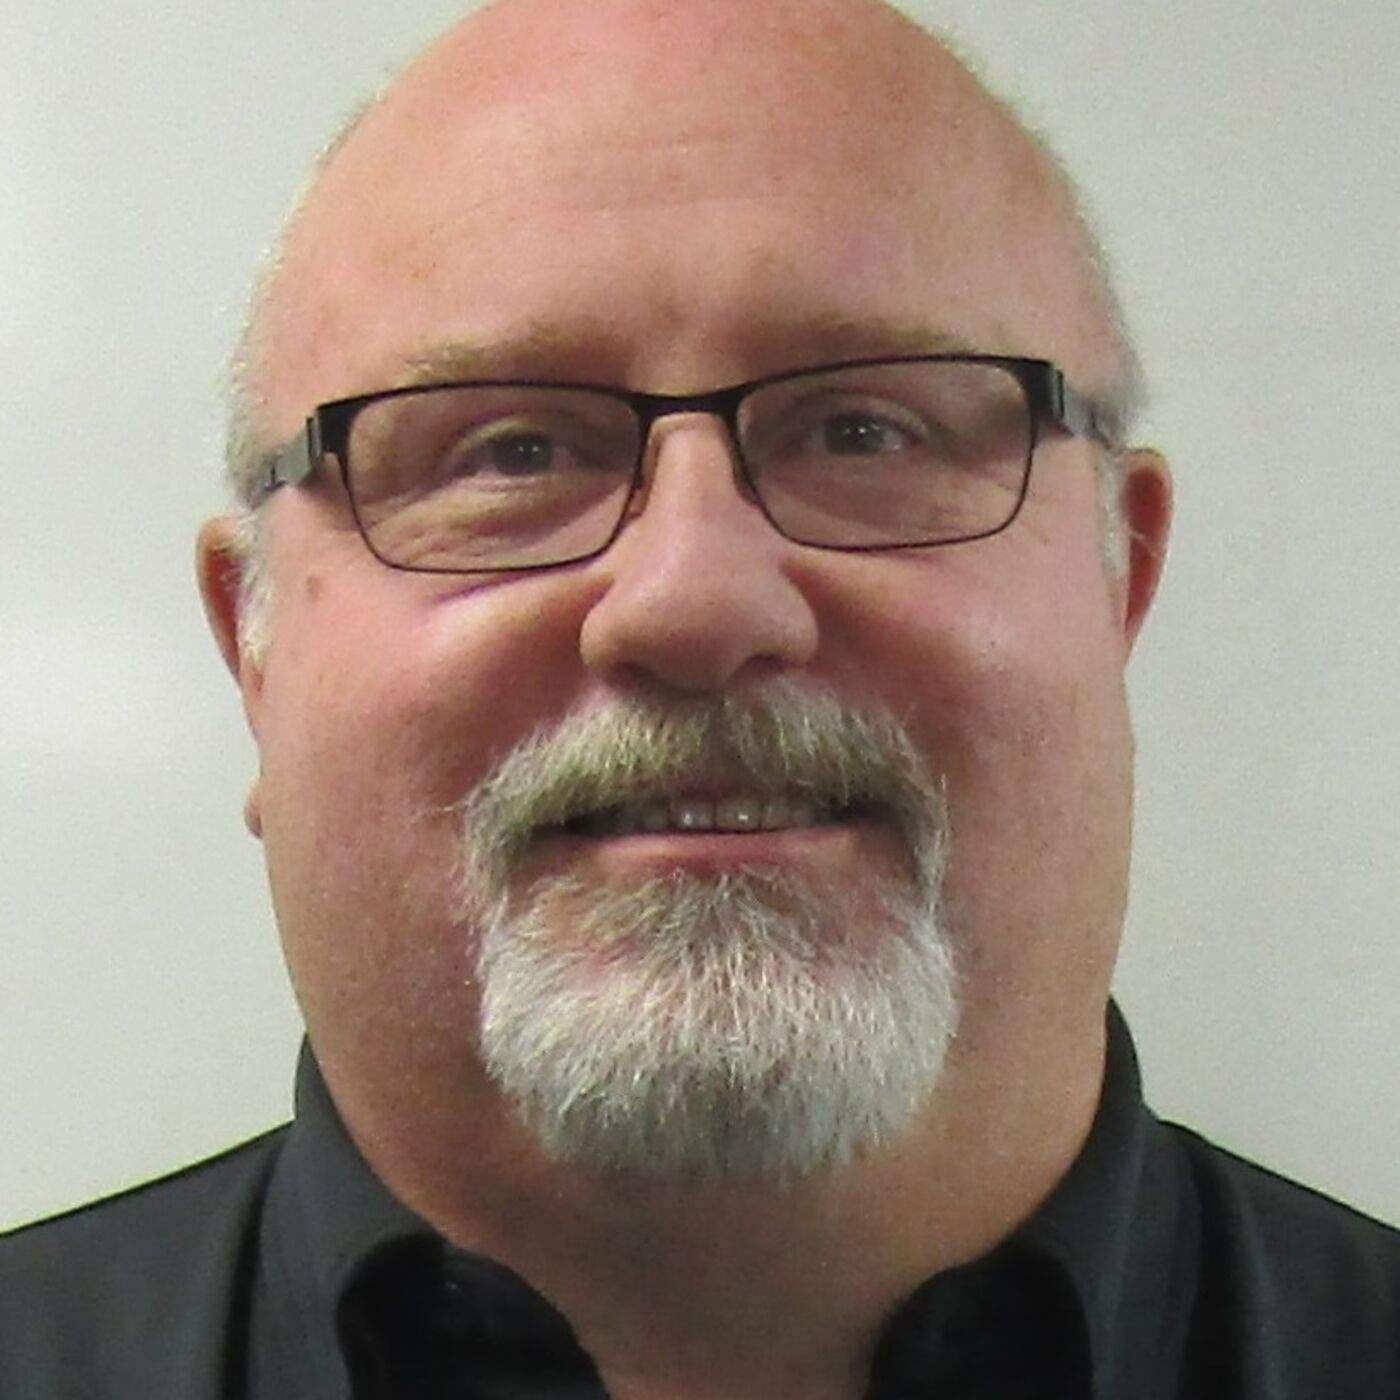 Ep. 1 w/ Ken Majors, Seneca County Emergency Services Director